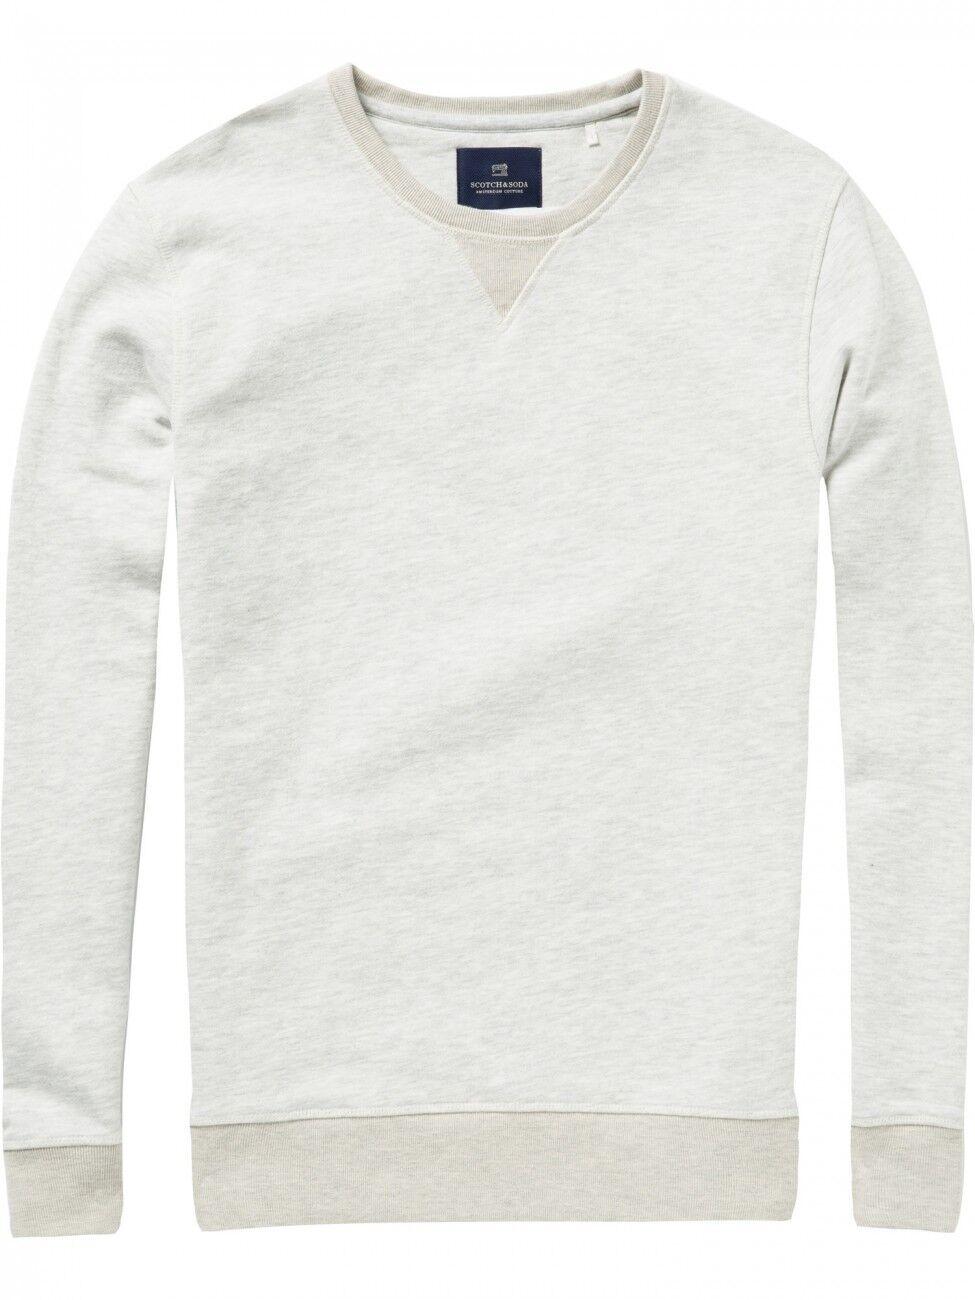 Scotch & Soda Herren Classic Sweater